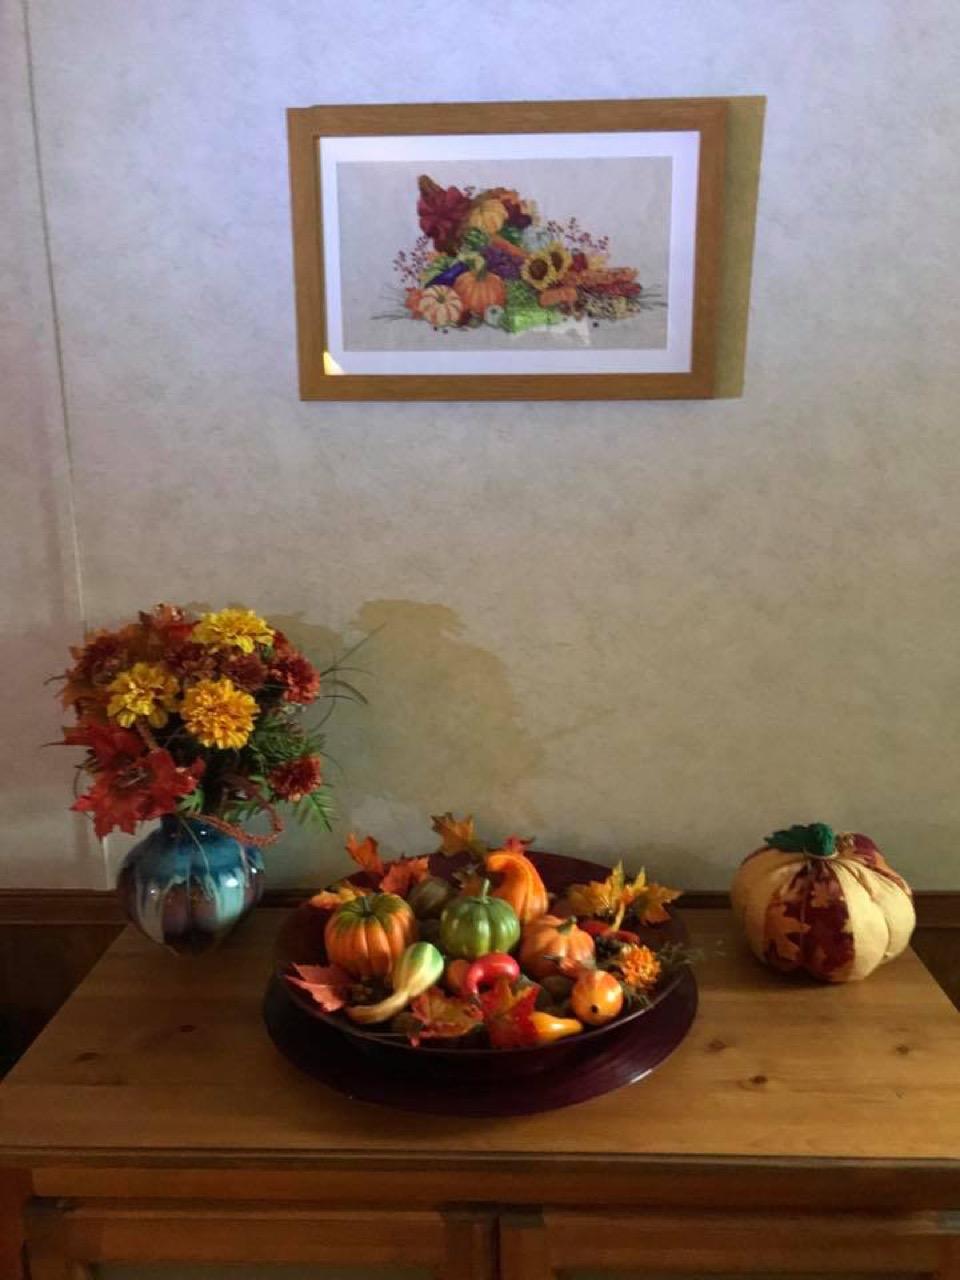 fall themed framed cross-stitch